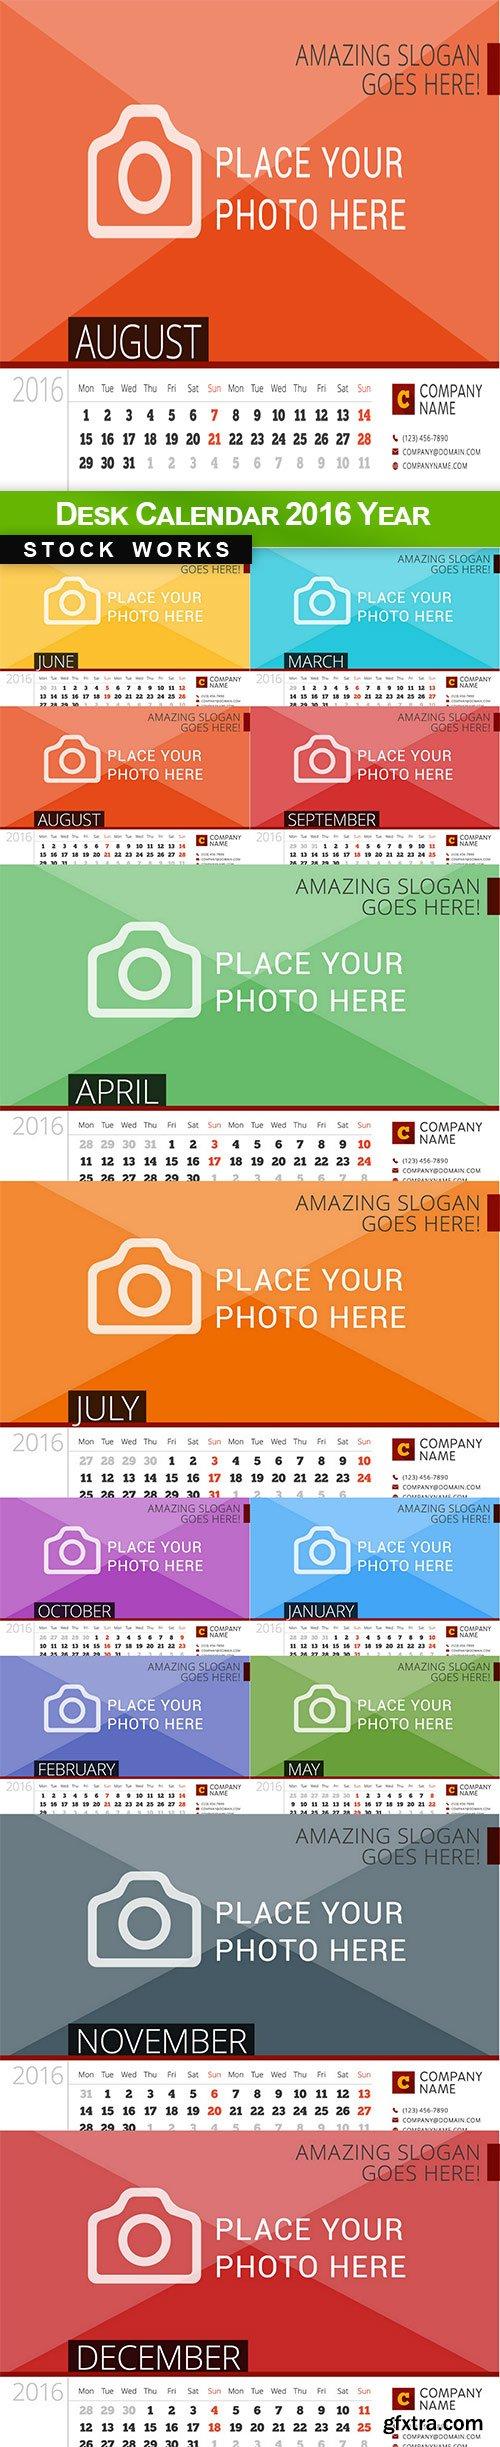 Desk Calendar 2016 Year - 12 EPS